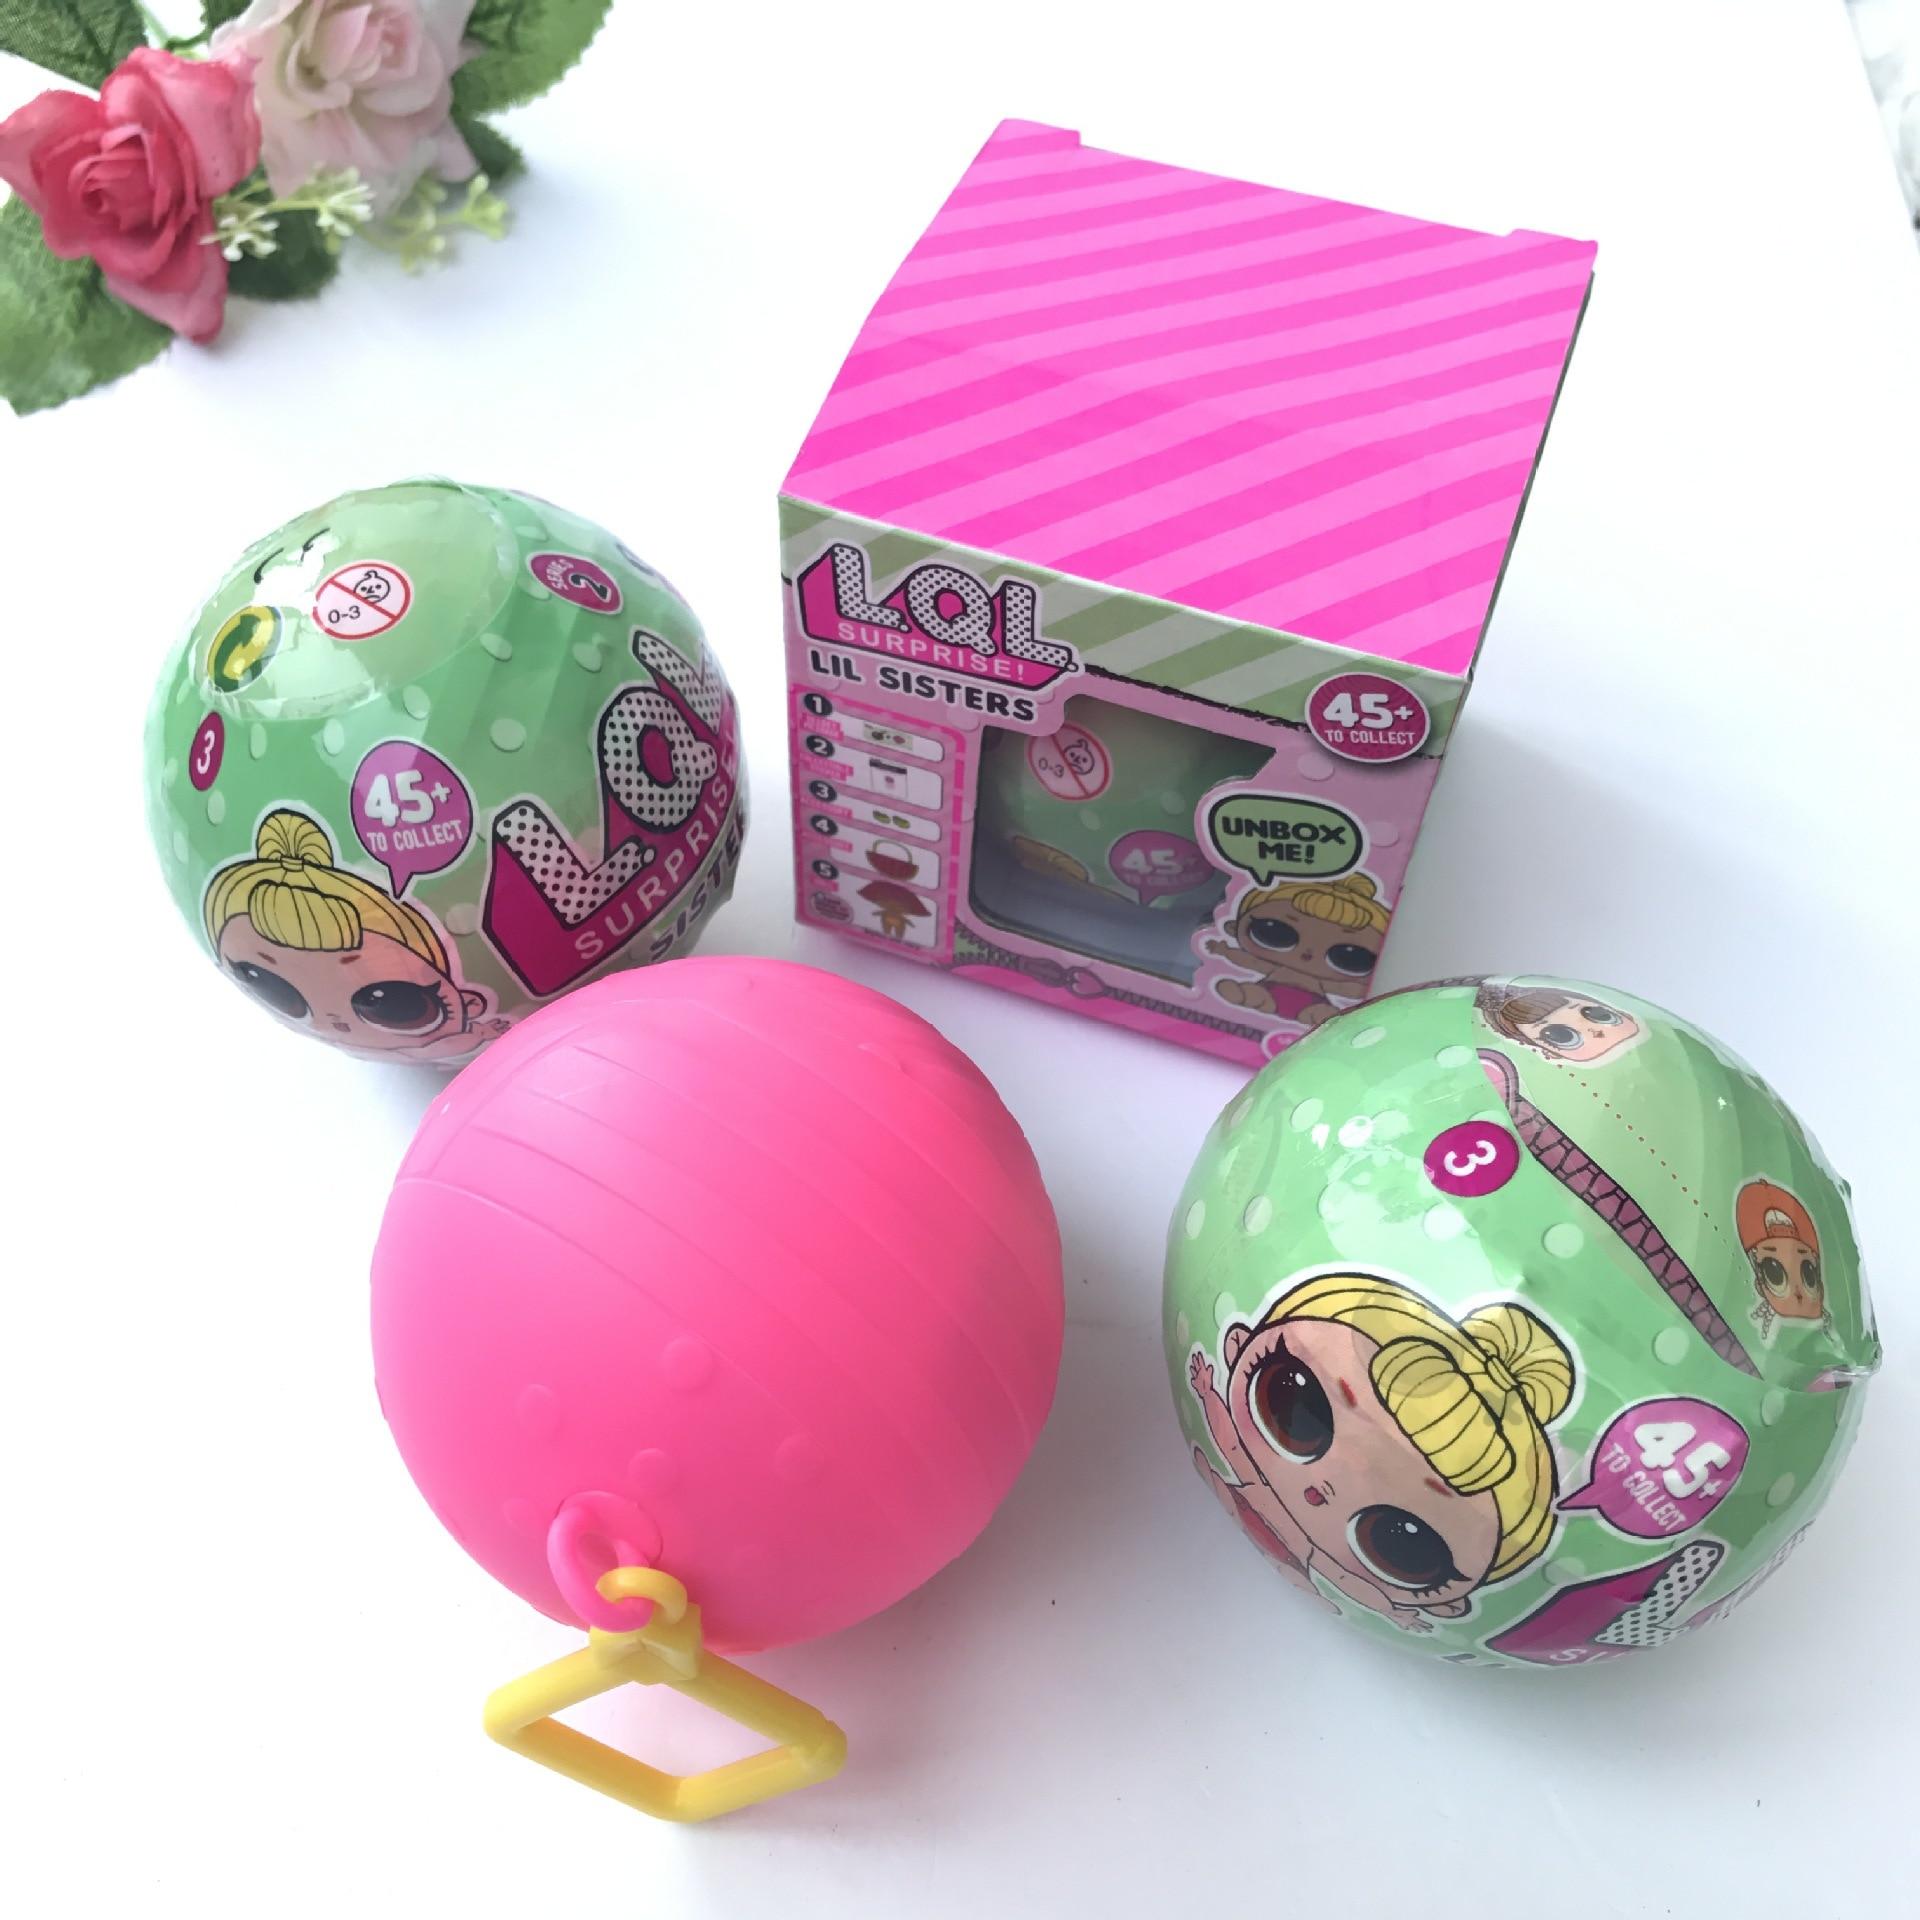 7cm-boneca-Surprise-Dress-Change-LOL-SURPRISE-DOLL-Baby-Tear-Open-Color-Change-Egg-Doll-Action-Figure-Toys-Send-Random-Kids-Gift-1